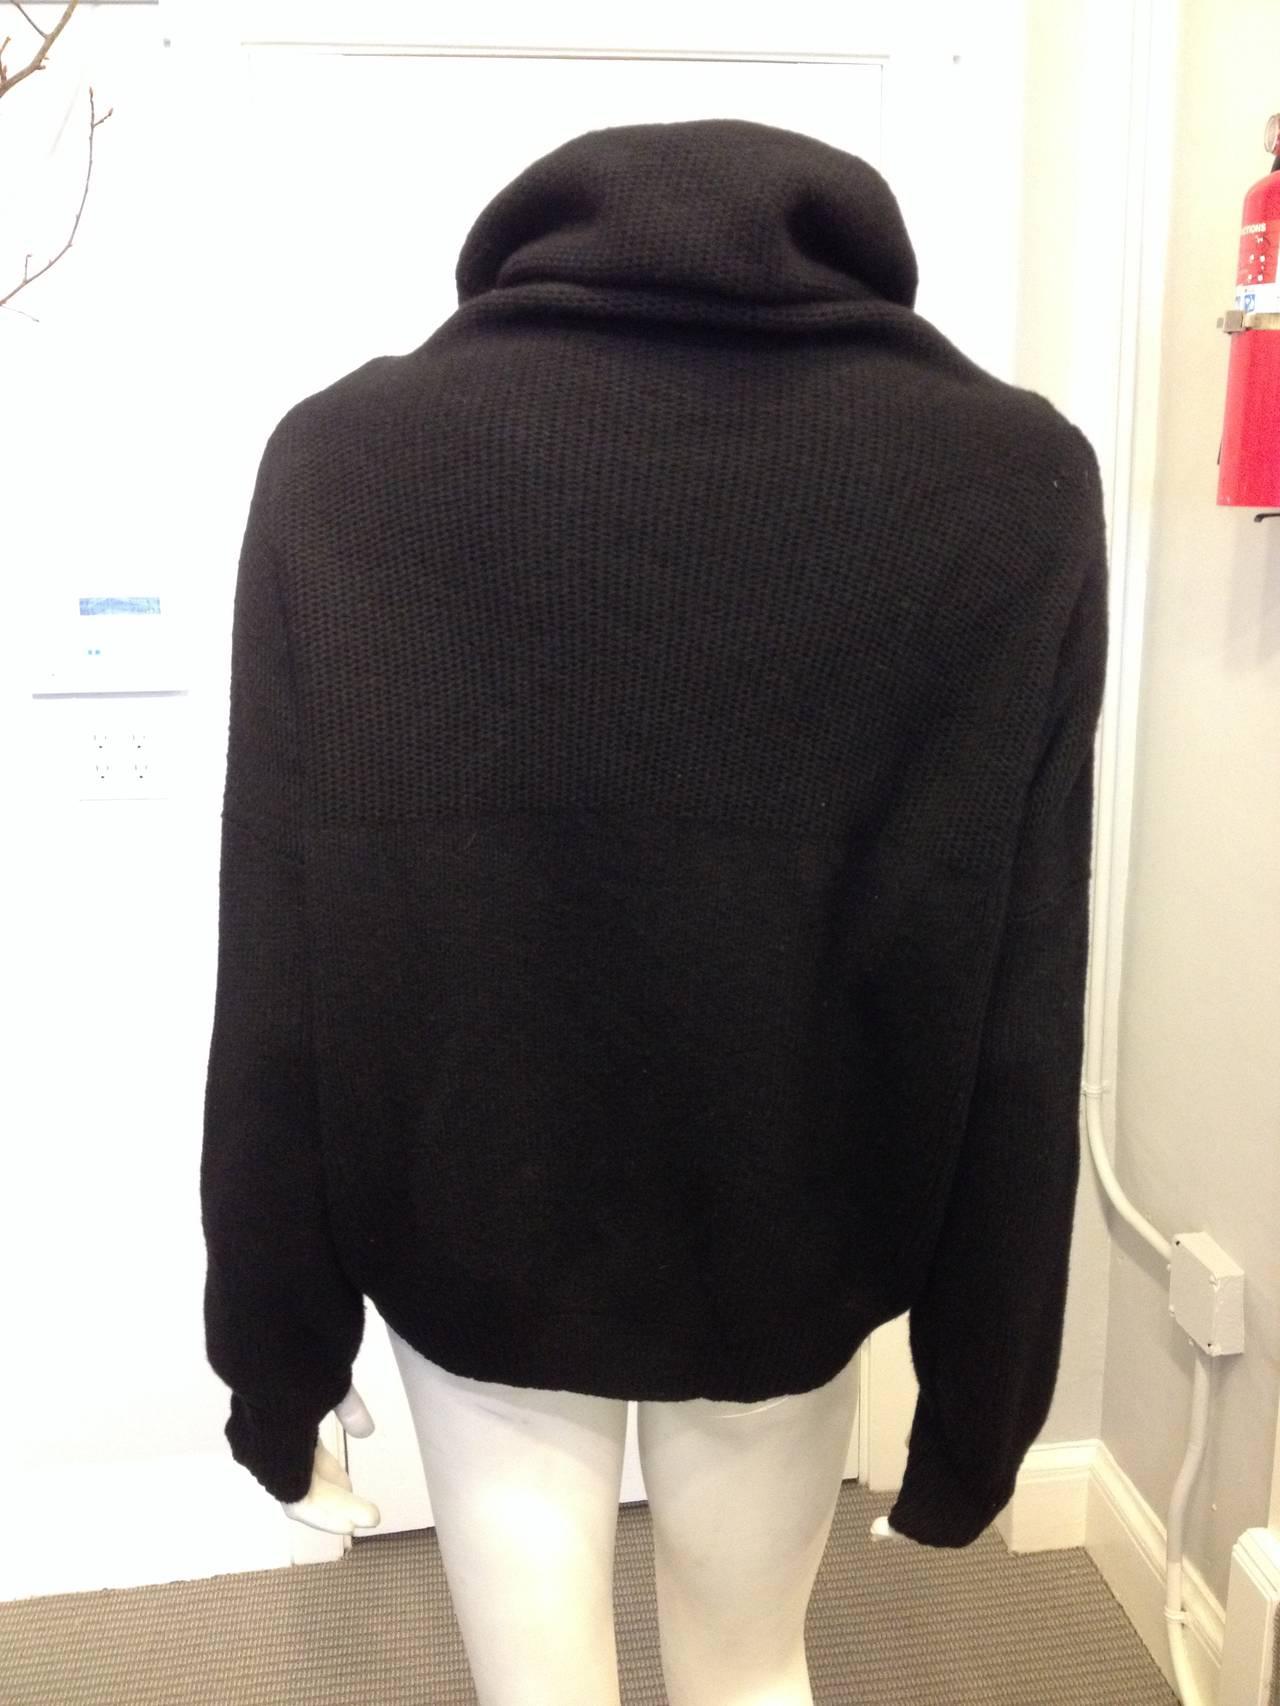 Hermes Black Turtleneck Sweater 5